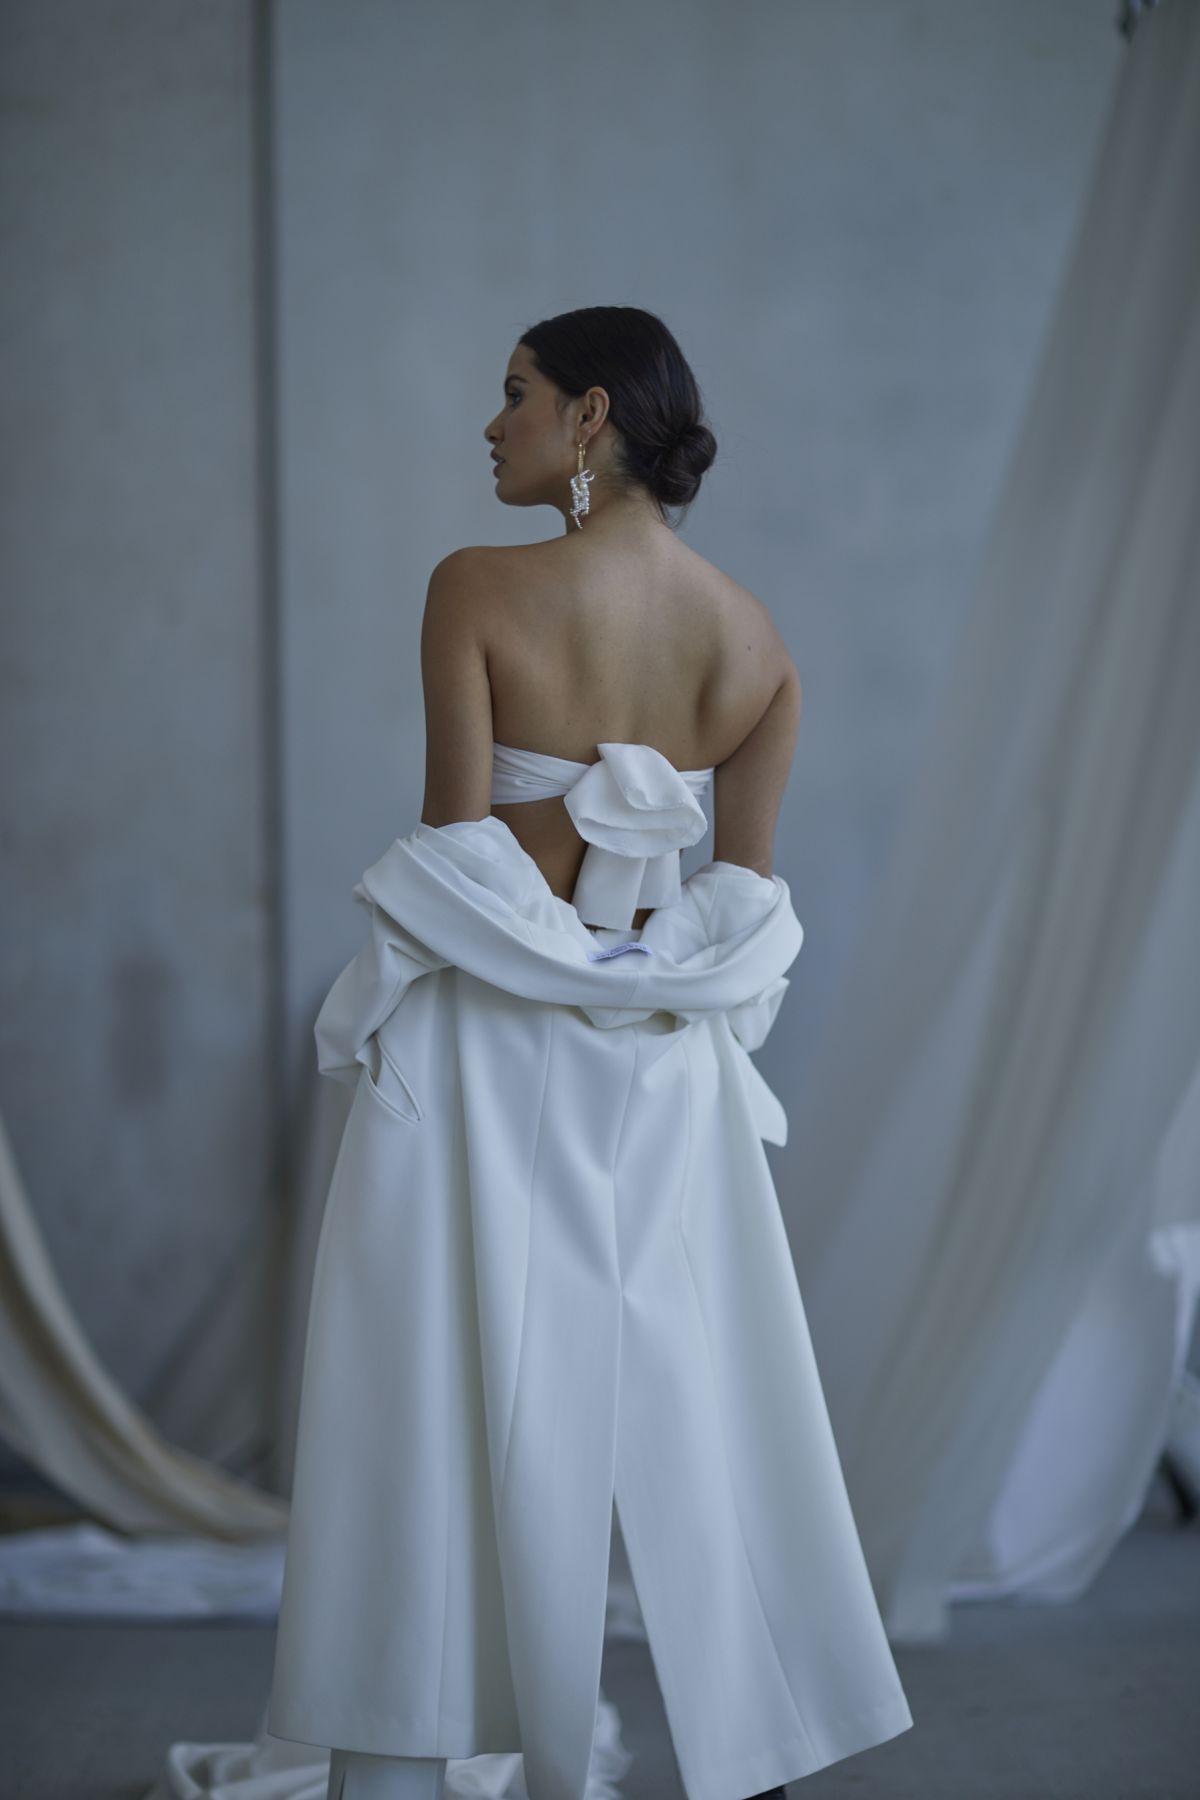 Marx Coat Wedding Gown 21_3860 1800Px